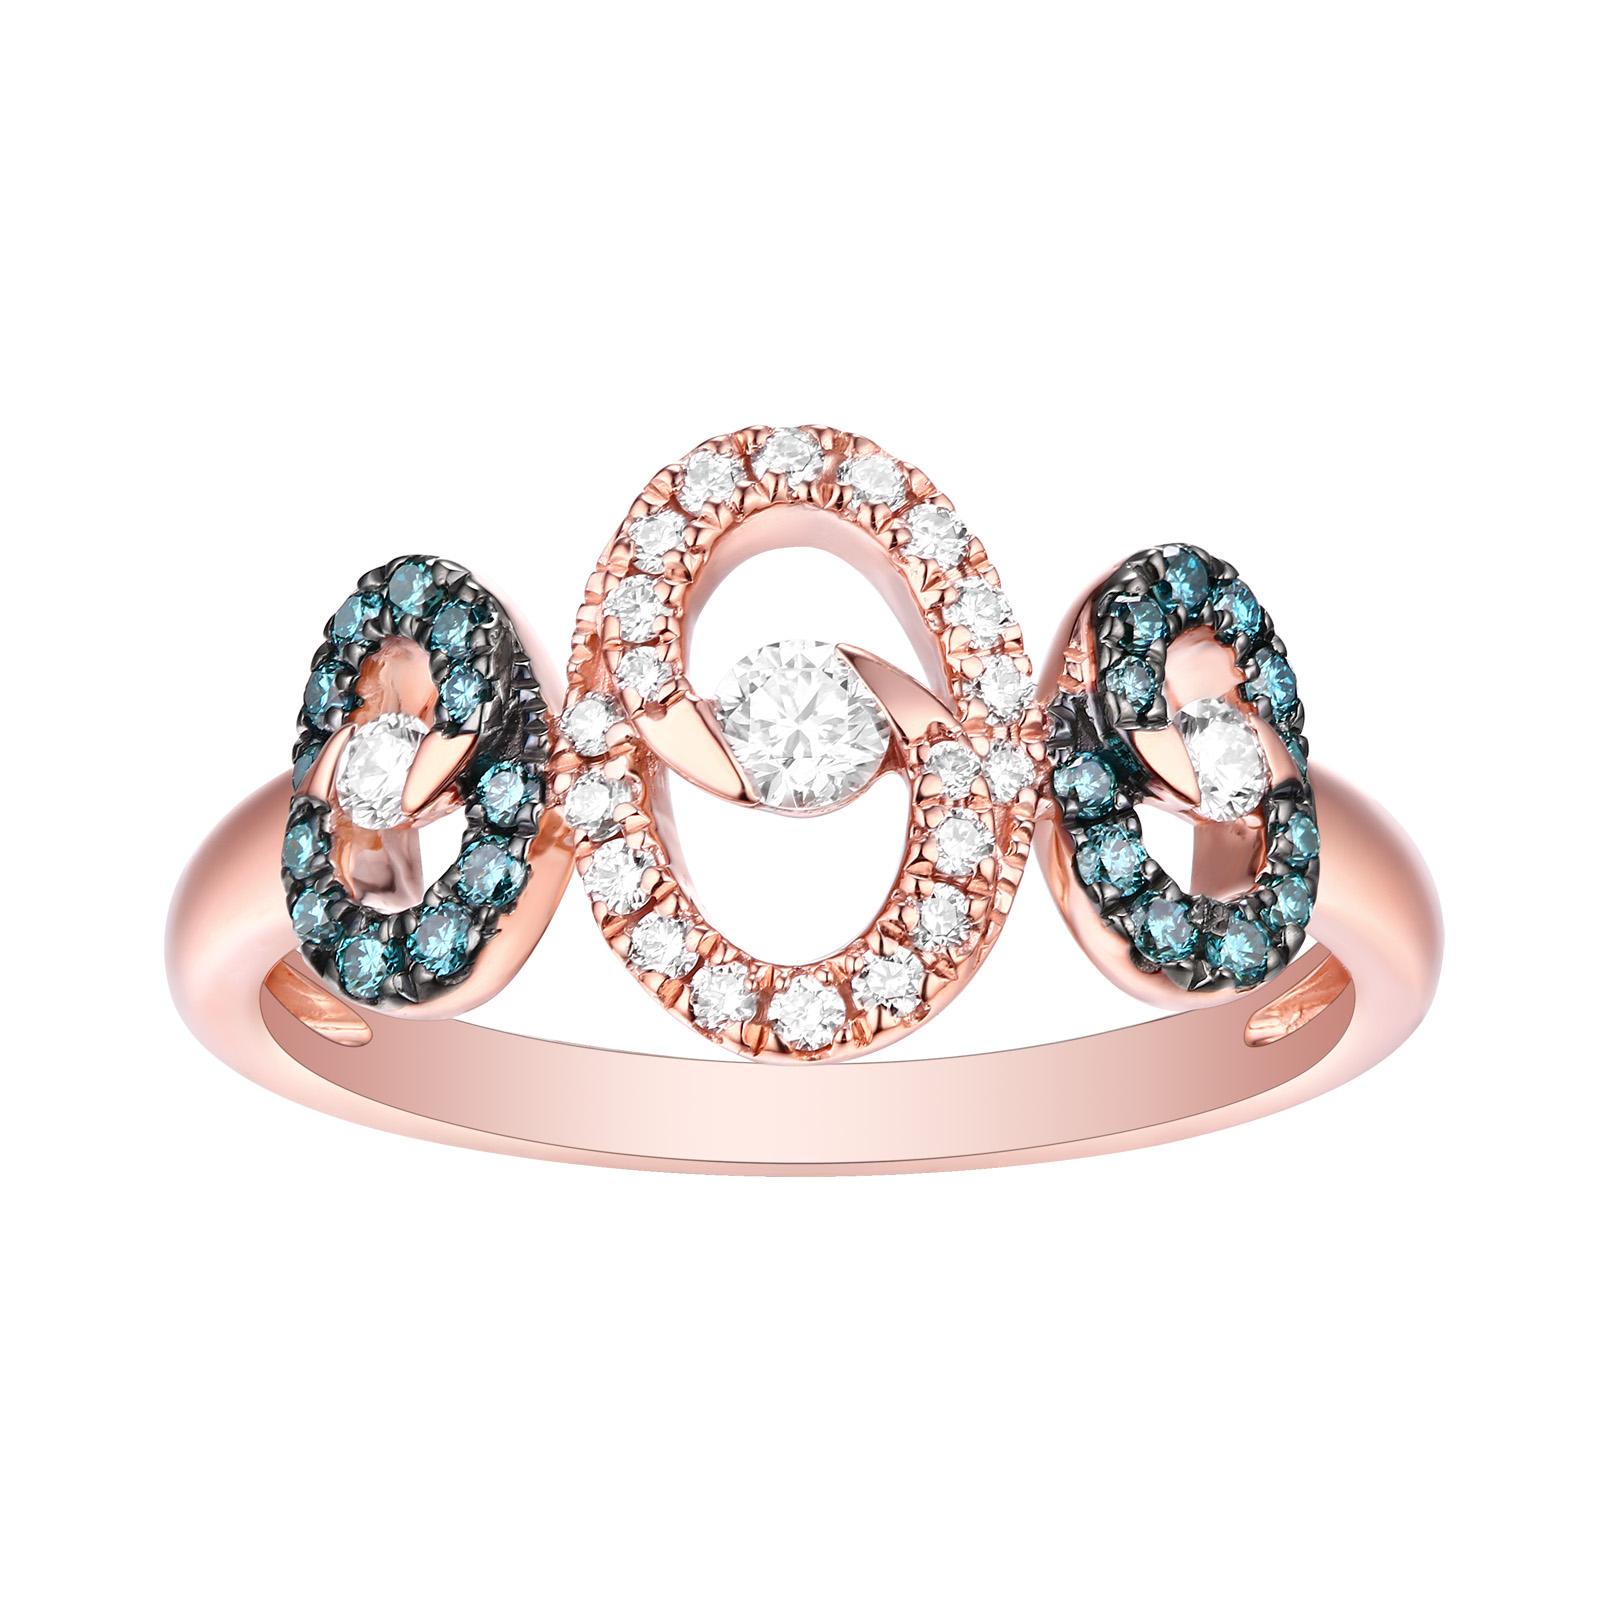 R26575WIC- 14K Rose Gold Diamond Ring, 0.42 TCW